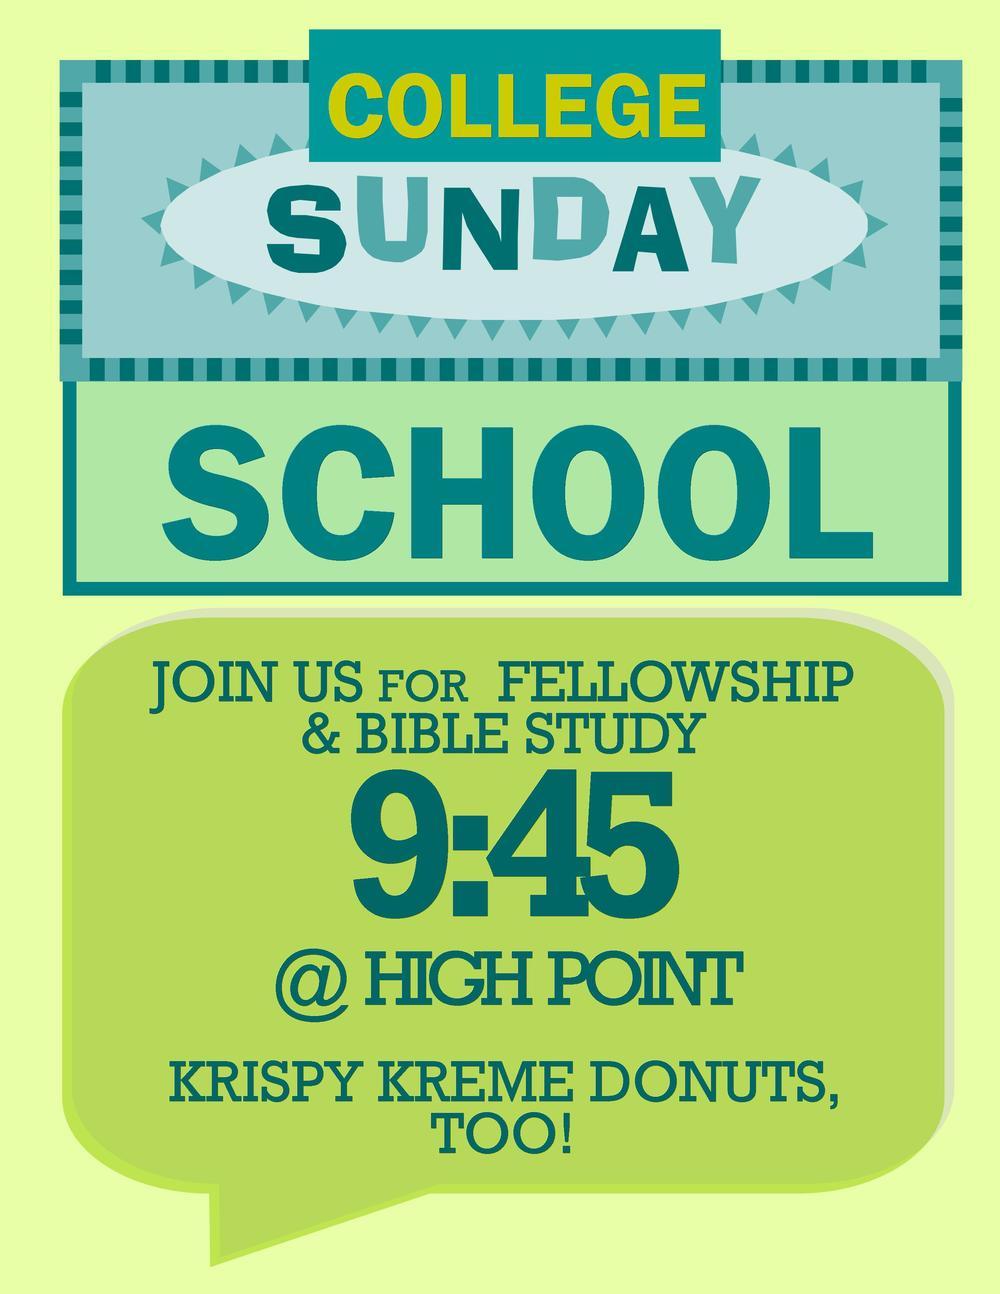 Sunday School-1.jpg